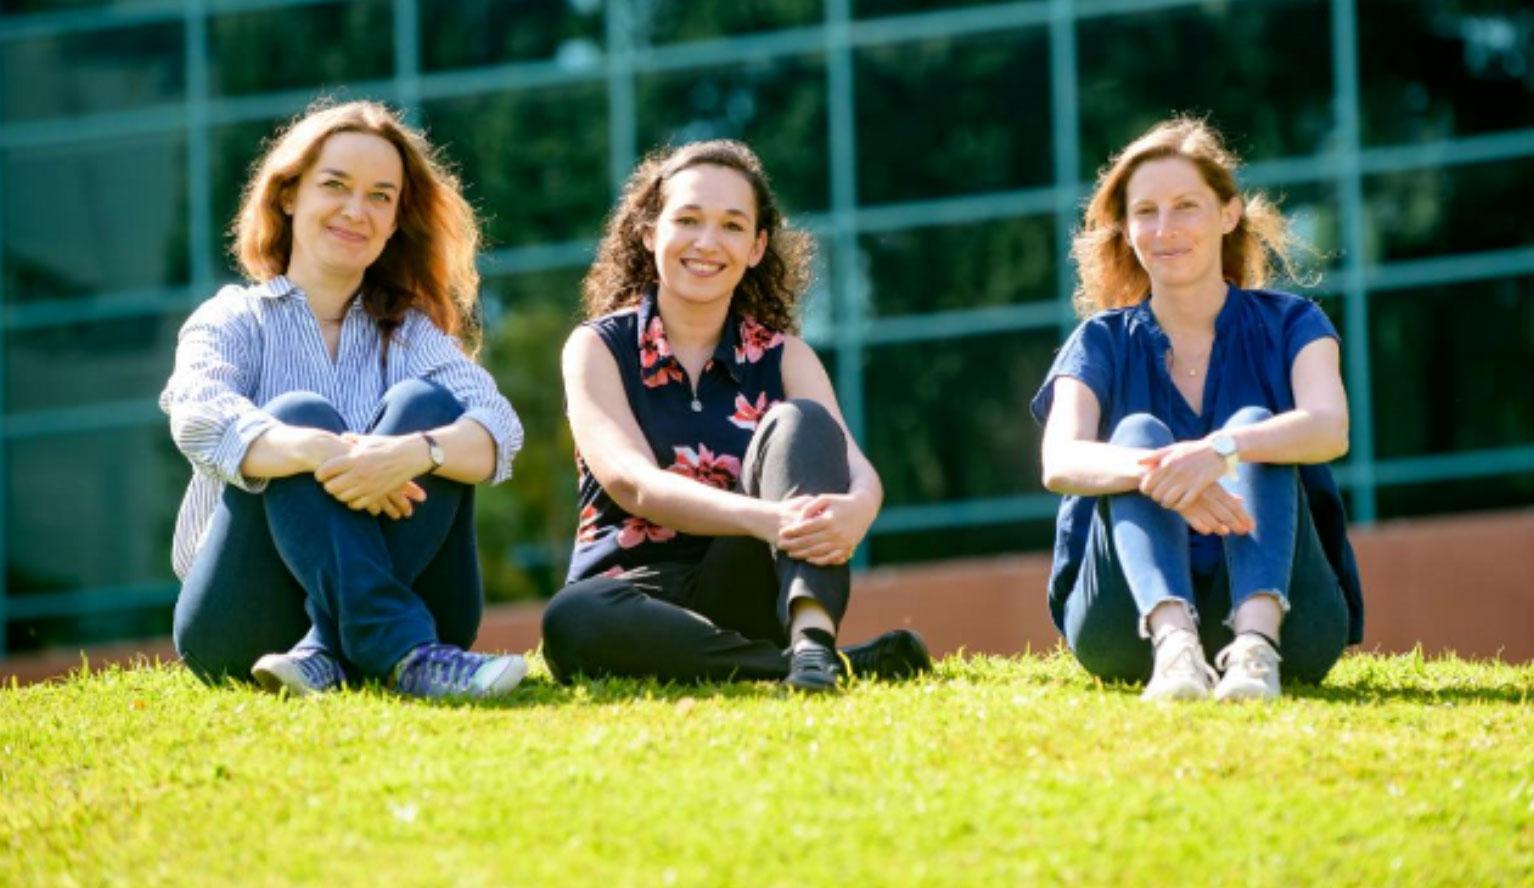 (de gauche à droite) Docteur Oksana Degtjarik, docteur Moran Shalev-Benami et Hadar Israeli